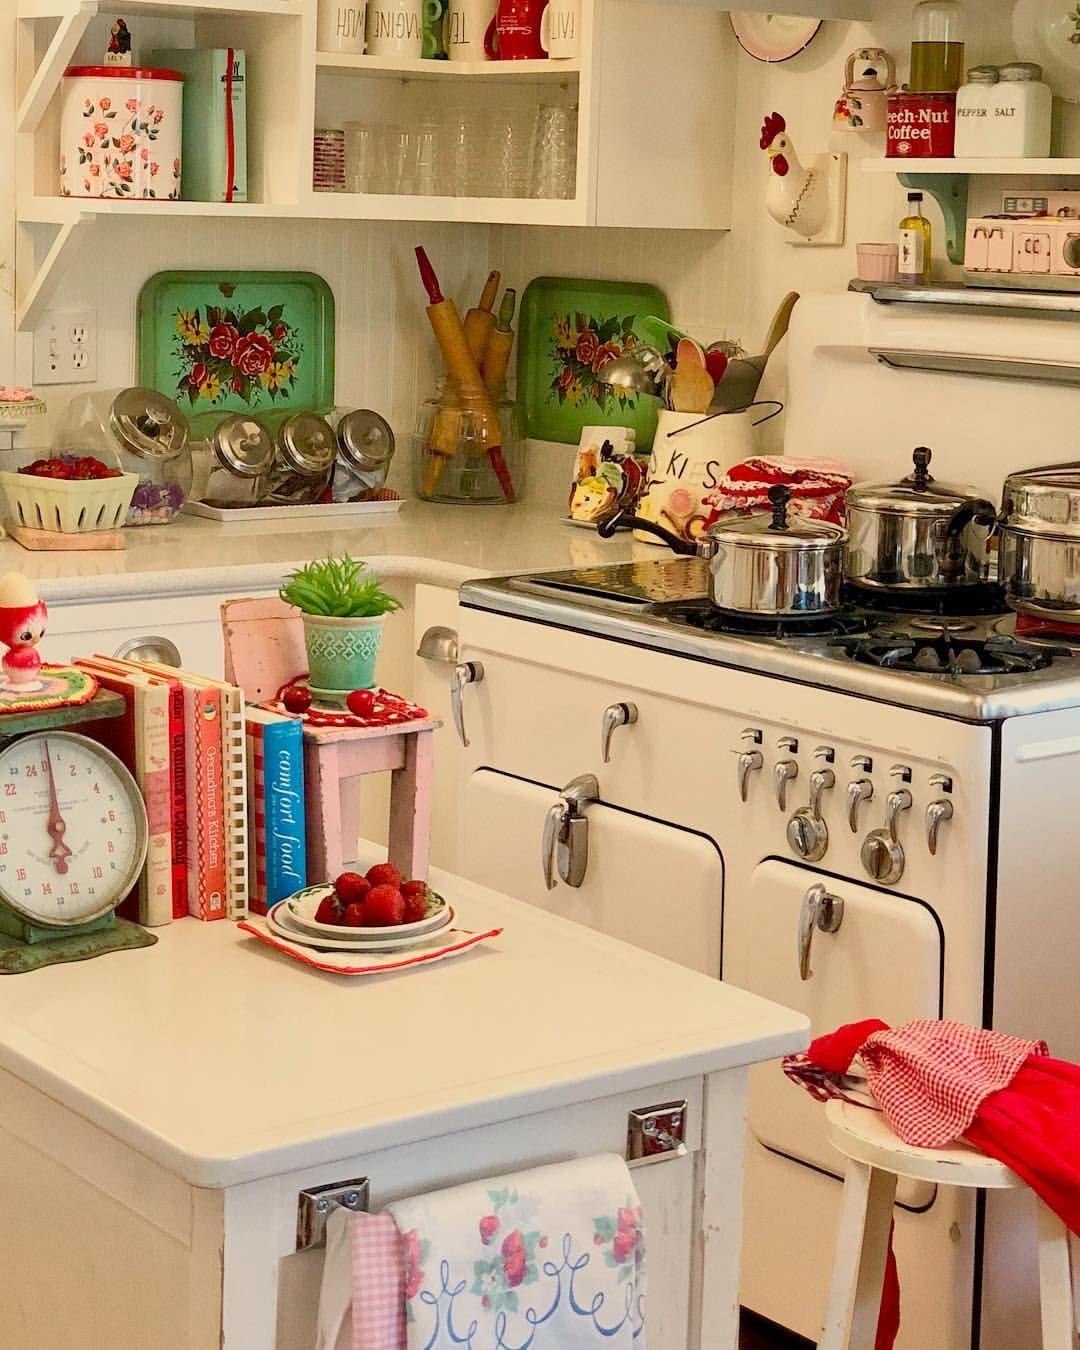 Good Morning Monday I Love Thrifting Flea Marketing Etc No Big Surprise There The Thrill Of T Vintage Kitchen Decor Retro Kitchen Kitschy Kitchen